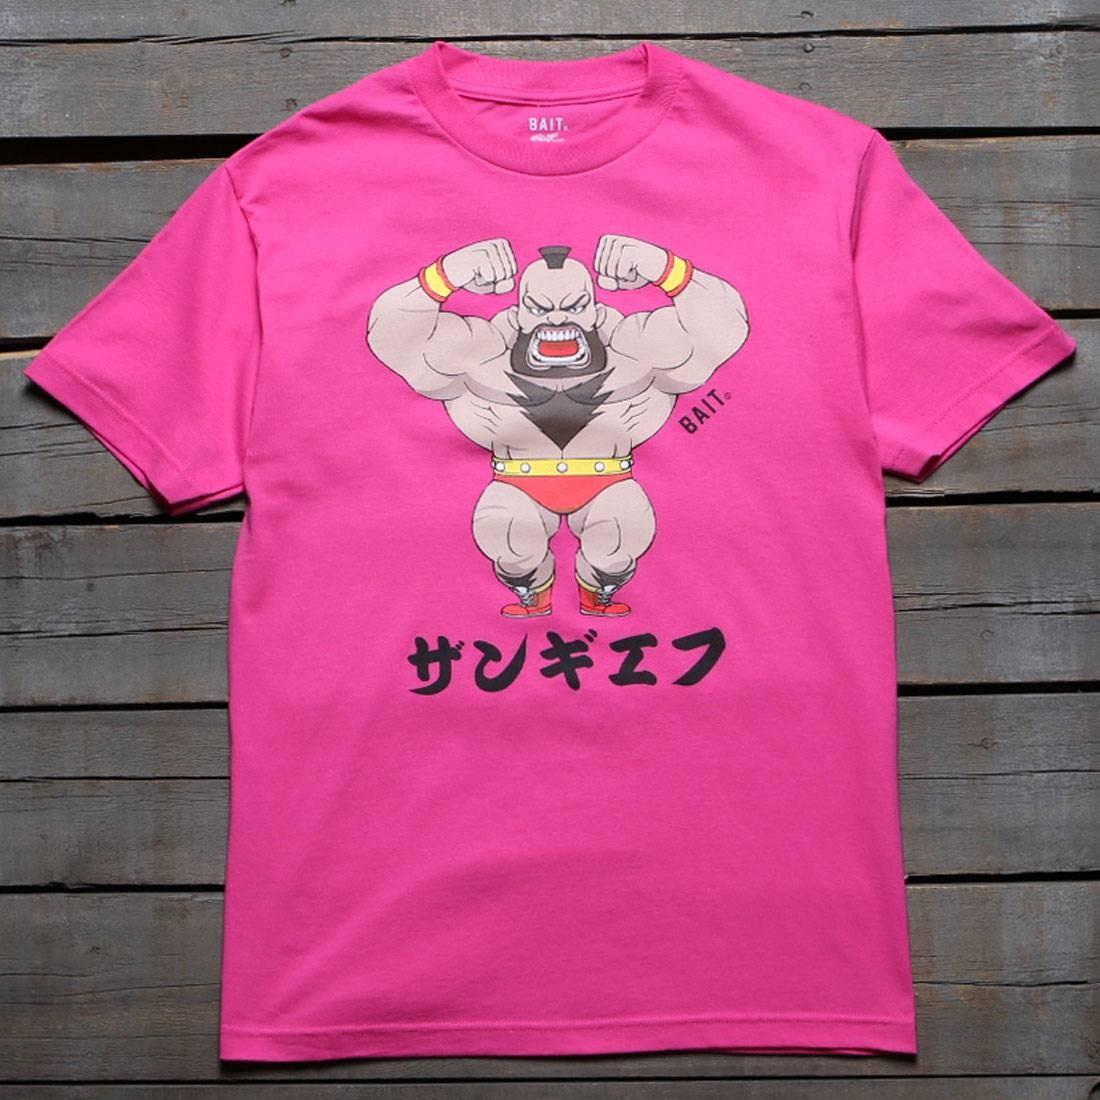 BAIT x Street Fighter Men Chibi Zangief Tee (pink / hot pink)